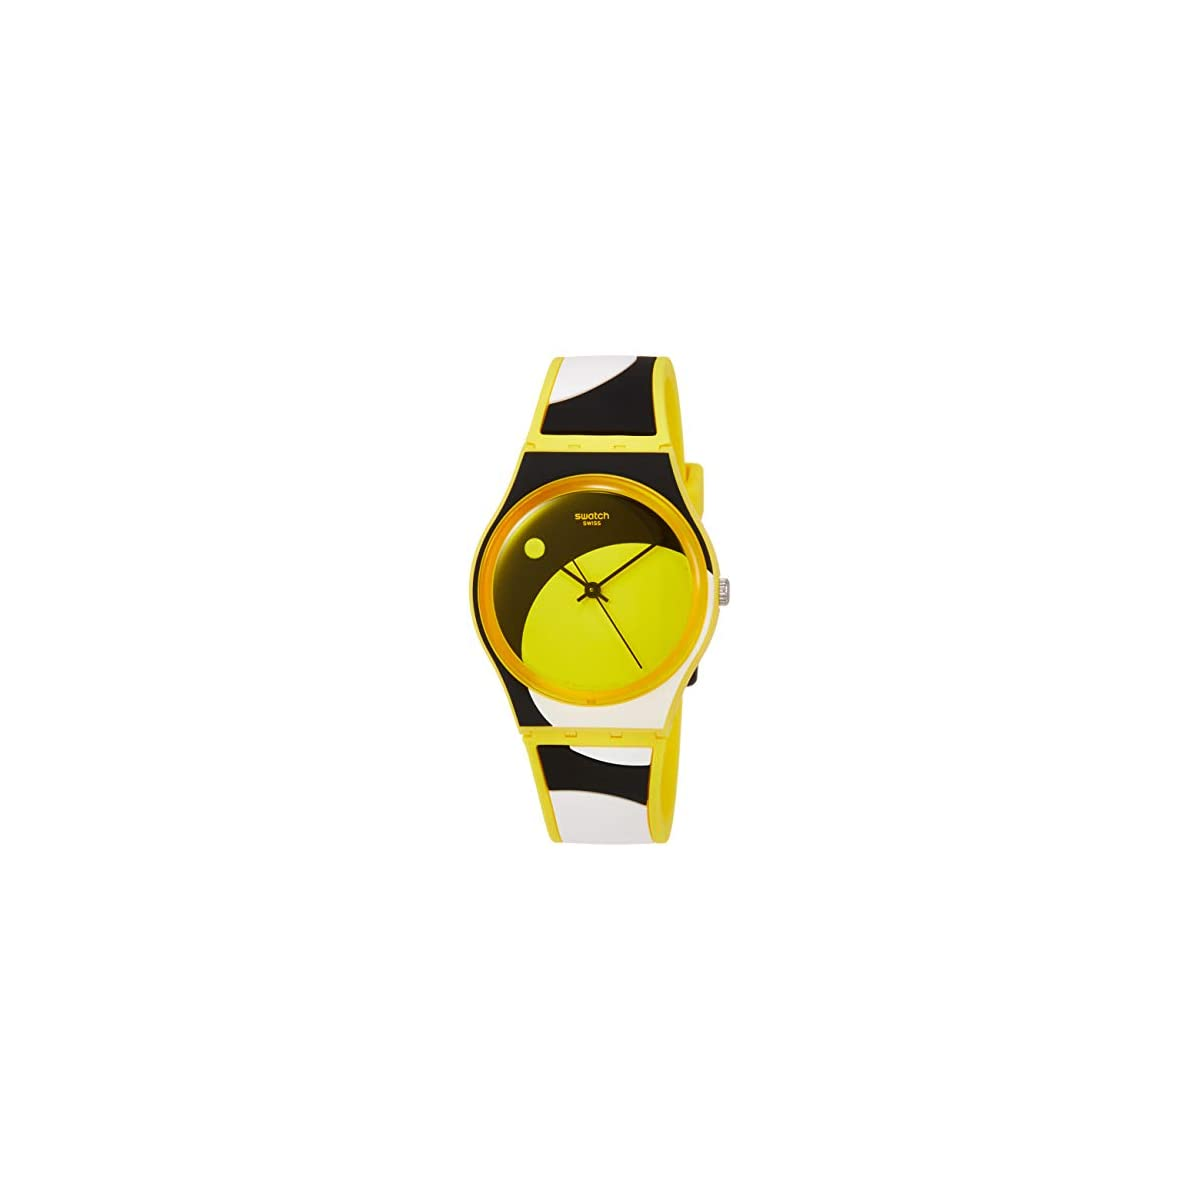 41DN8KvMNoL. SS1200  - Swatch Reloj Analógico para Unisex Adultos de Cuarzo con Correa en Silicona GJ139